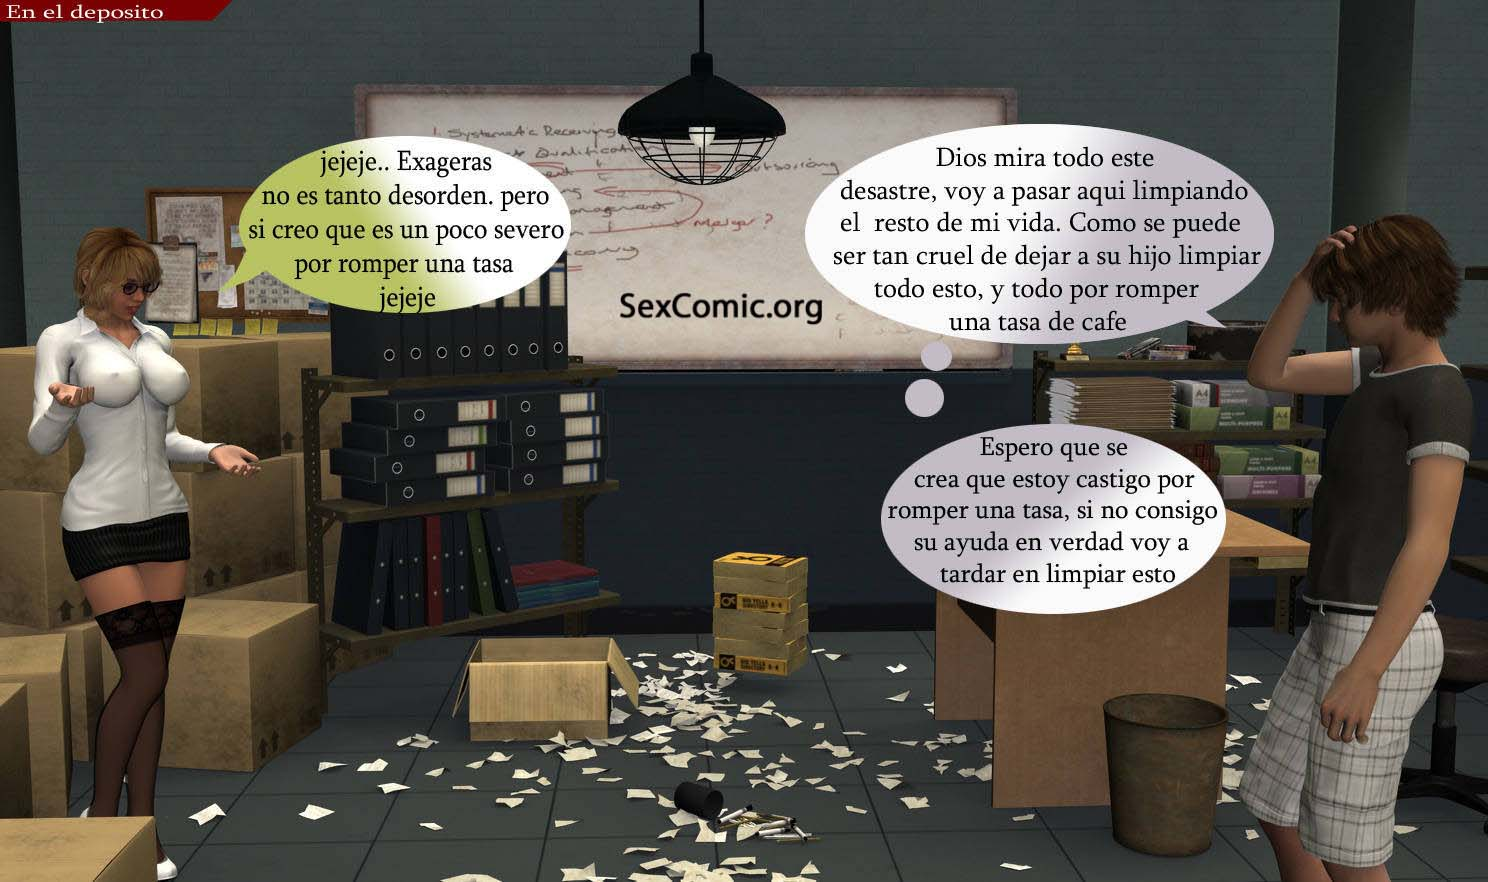 comic-xxx-3d-seduciendo-alas-empleadas-de-mama-historias-sexuales-mangas-para-adultos-videos-deincesto-comics-xxx-historias-eroticas-fantacias-sexuales-gtaris-online-26